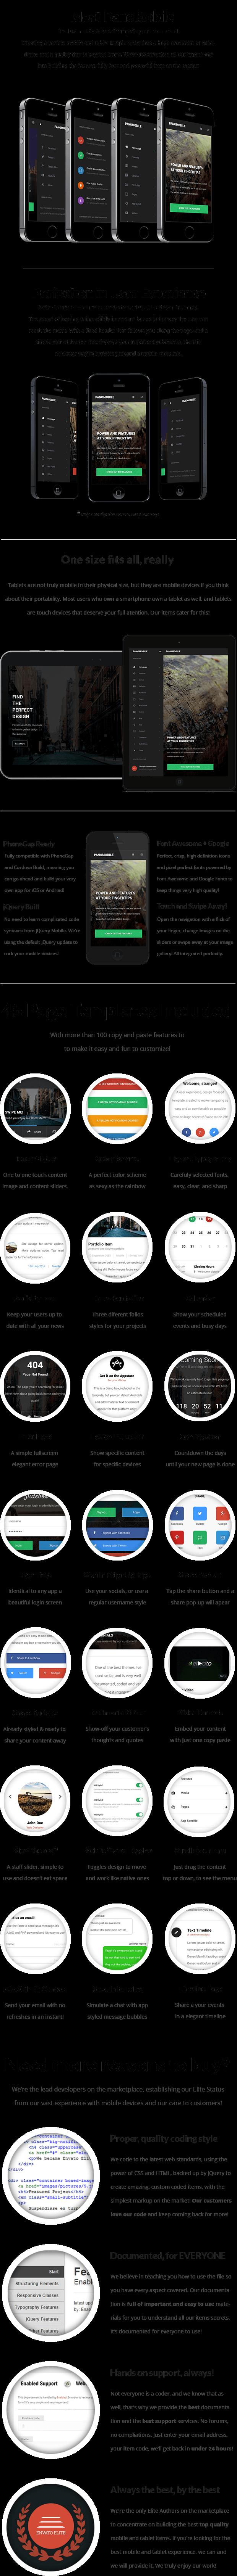 Pano Mobile | Mobile Template - 8